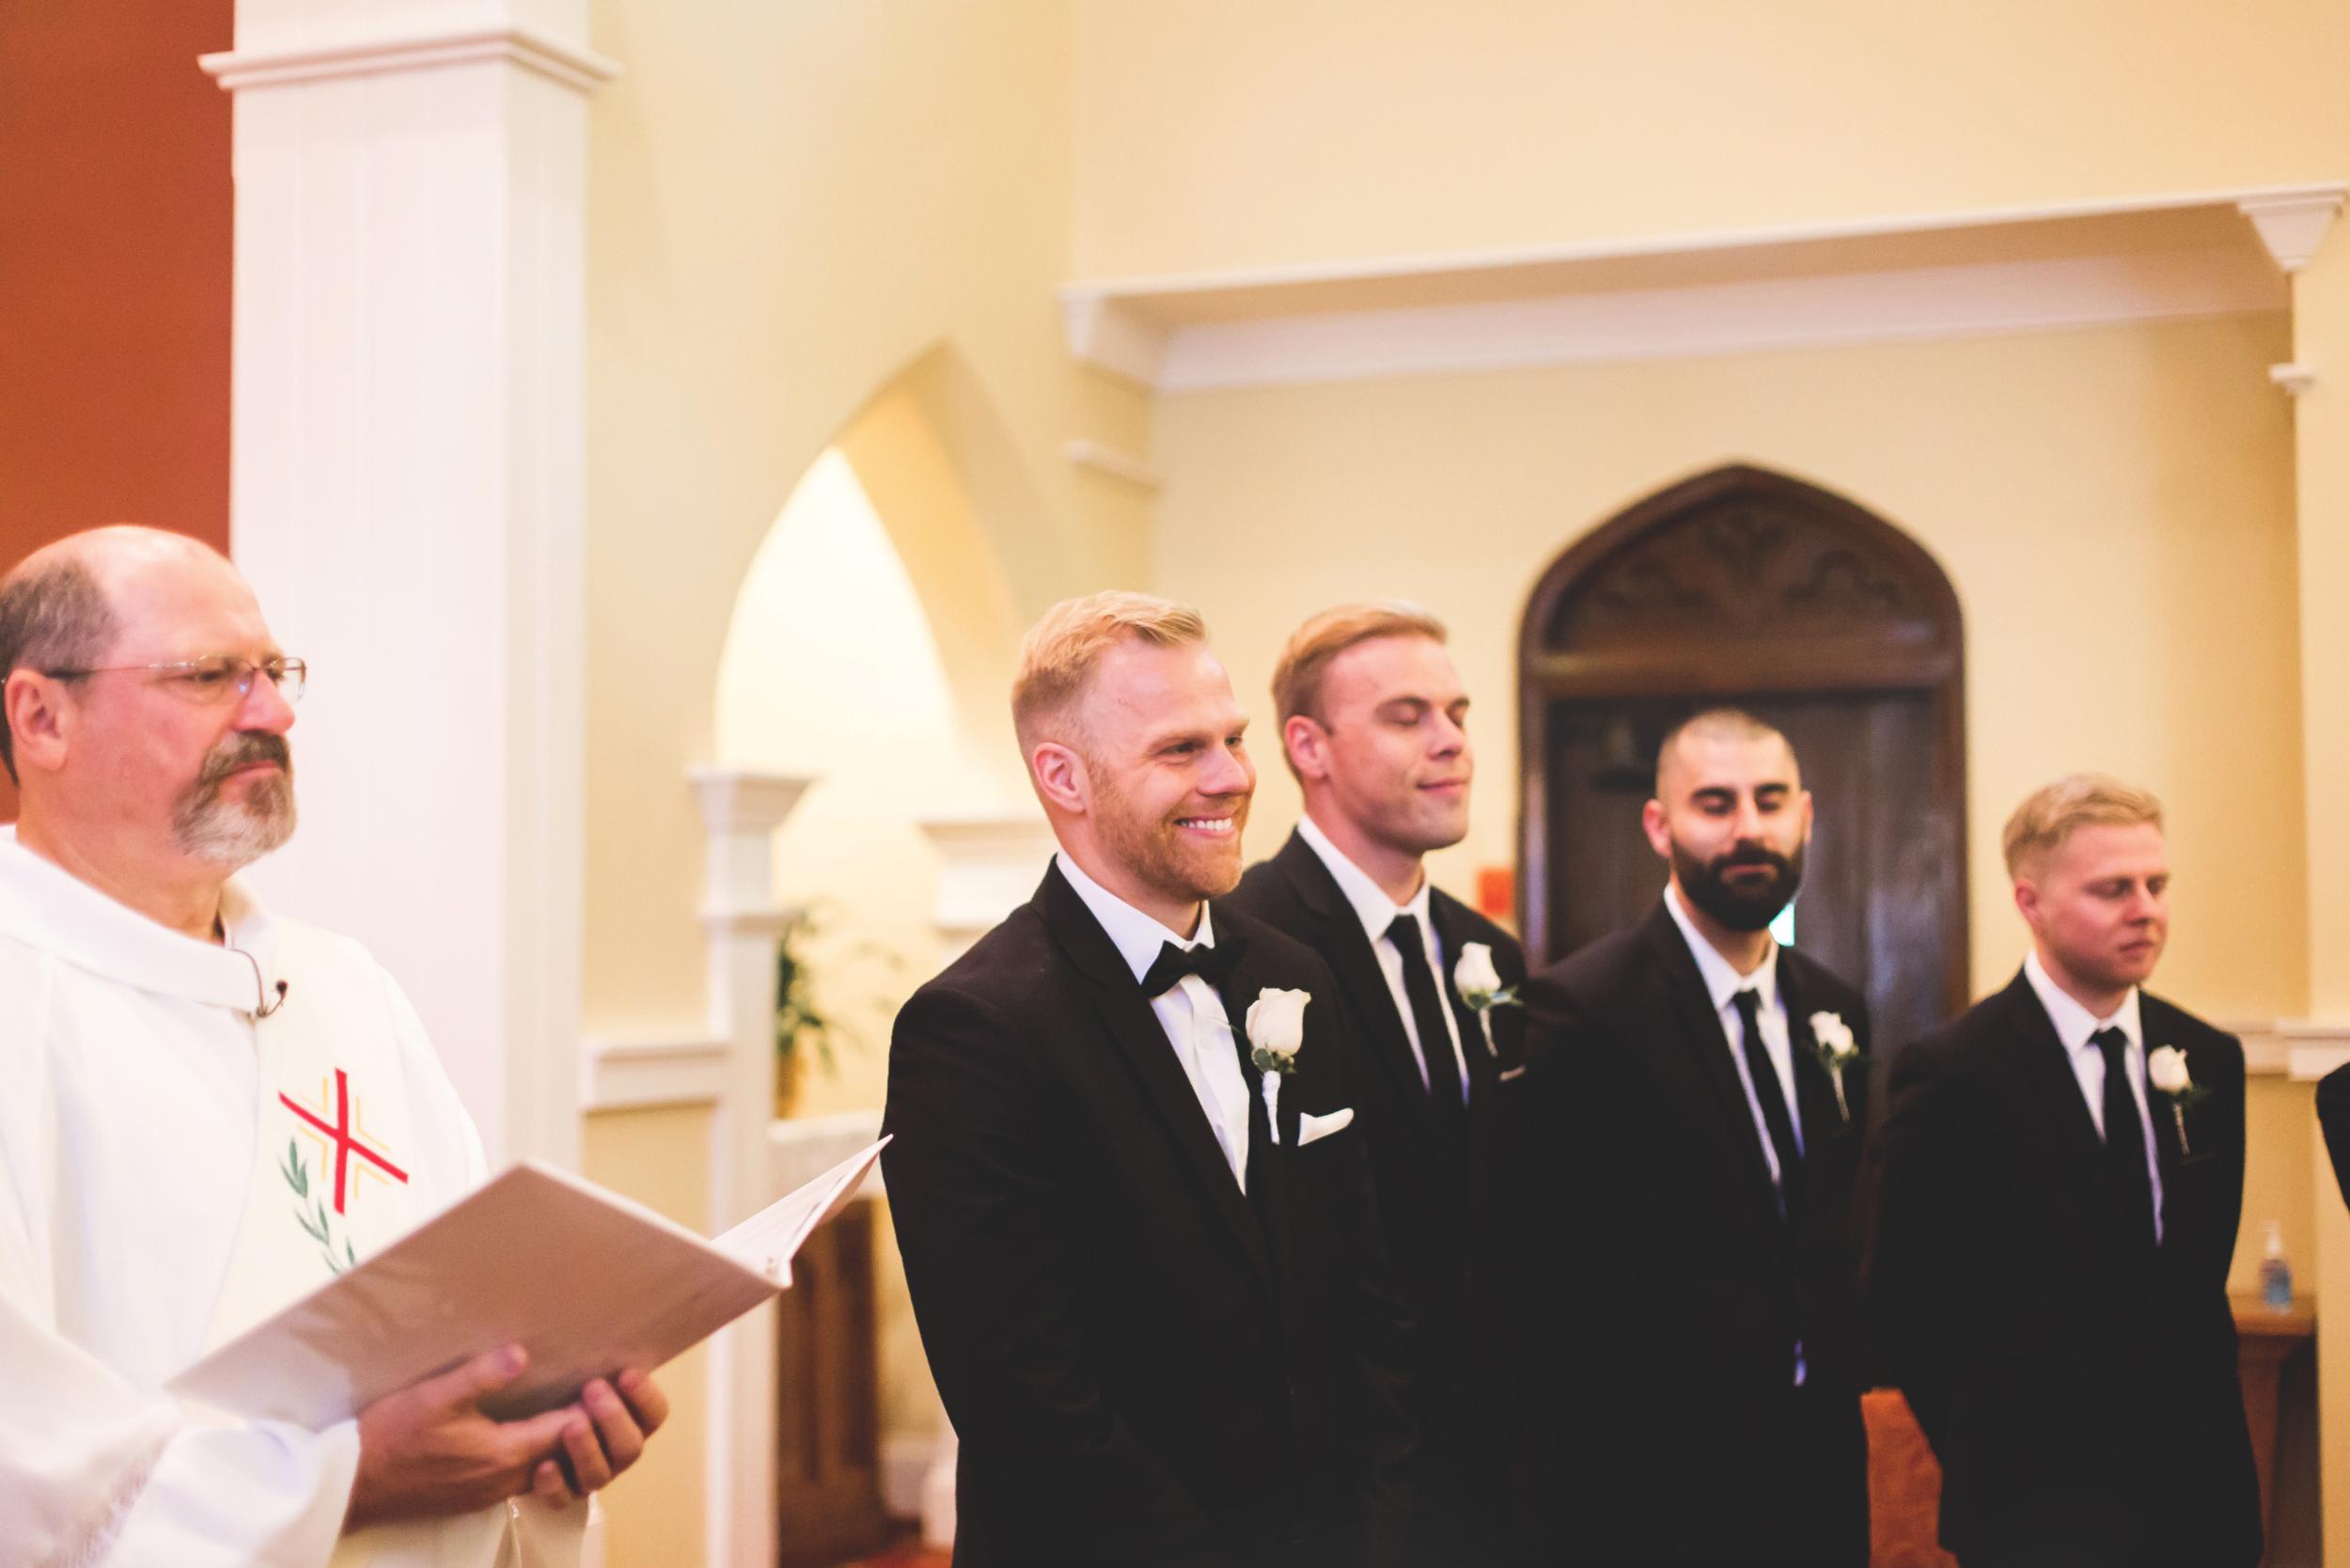 Wedding-Harbour-Banquet-Center-Oakville-Photographer-Wedding-Hamilton-Saint-James-Espresso-Downtown-HamOnt-GTA-Niagara-Toronto-Moments-by-Lauren-Photography-Photo-Image-13.png